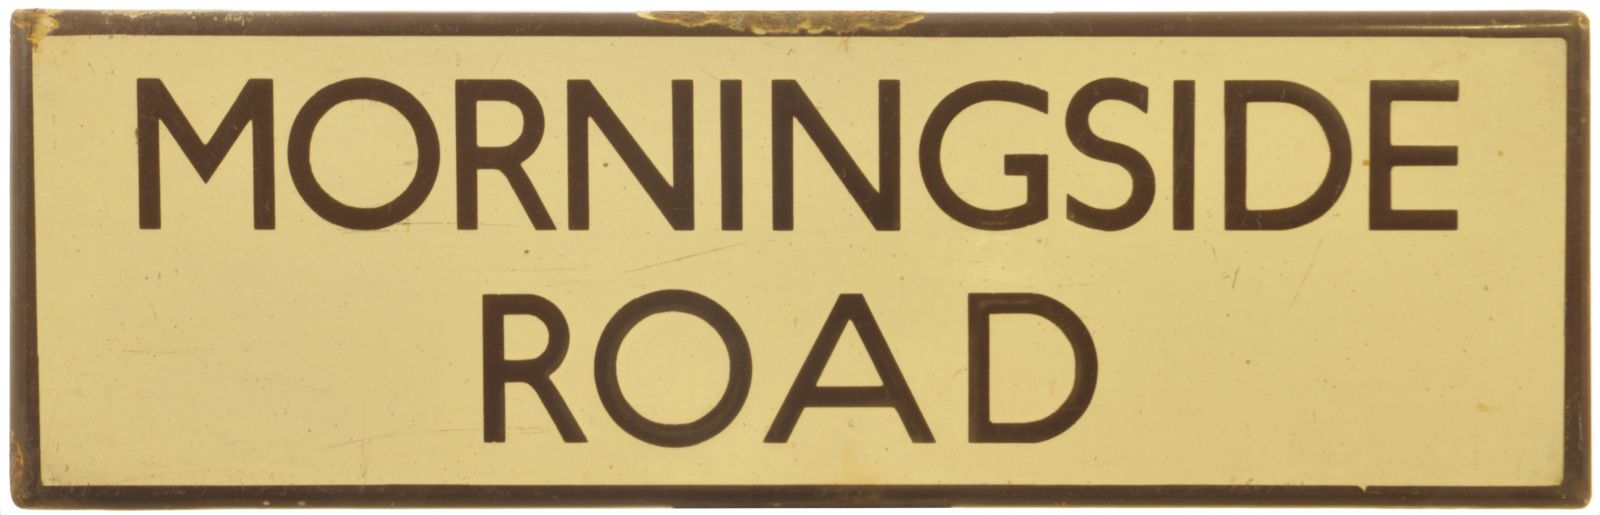 Lot 7 - Railway Station Direction Signs, Morningside Road, Lamp Tablet: An LNER lamp tablet, MORNINGSIDE